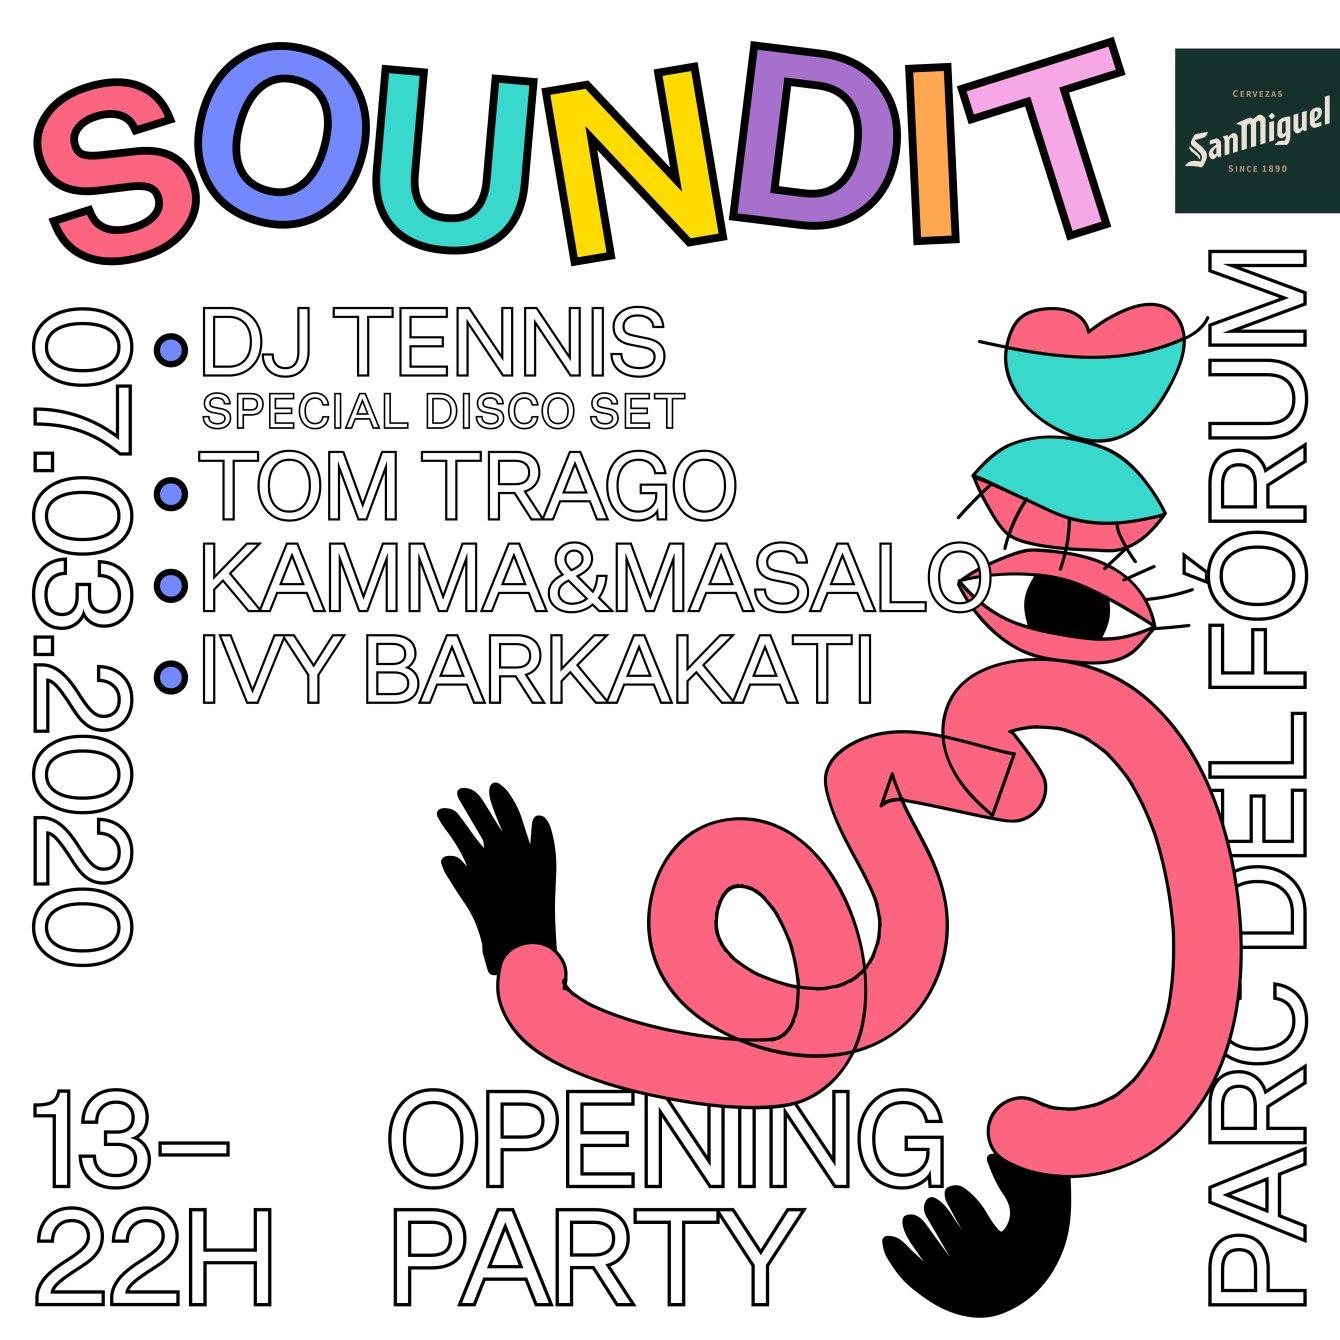 SOUNDIT Opening Party: Dj Tennis, Tom Trago, Kamma & Masalo, Ivy Barkakati - Flyer front